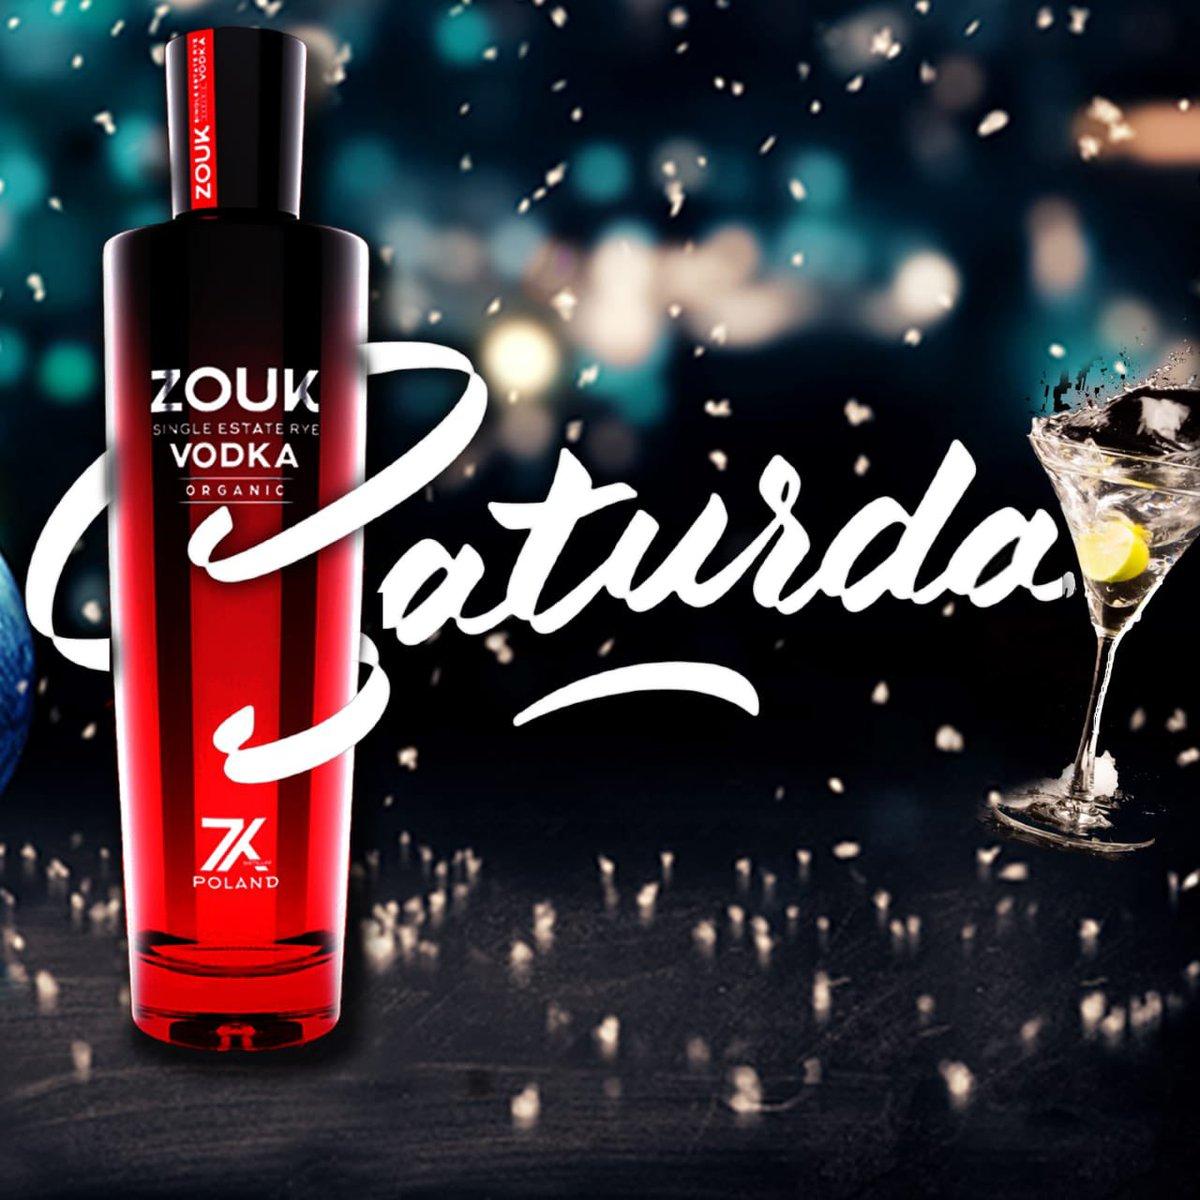 Saturday Vibes  or Vodka Vibes ?  Saturday + Vodka = Perfect Weekend Vibes ✅🍸 #zoukvodka #vodka #saturdayvibes #saturdaynight #saturdaymood